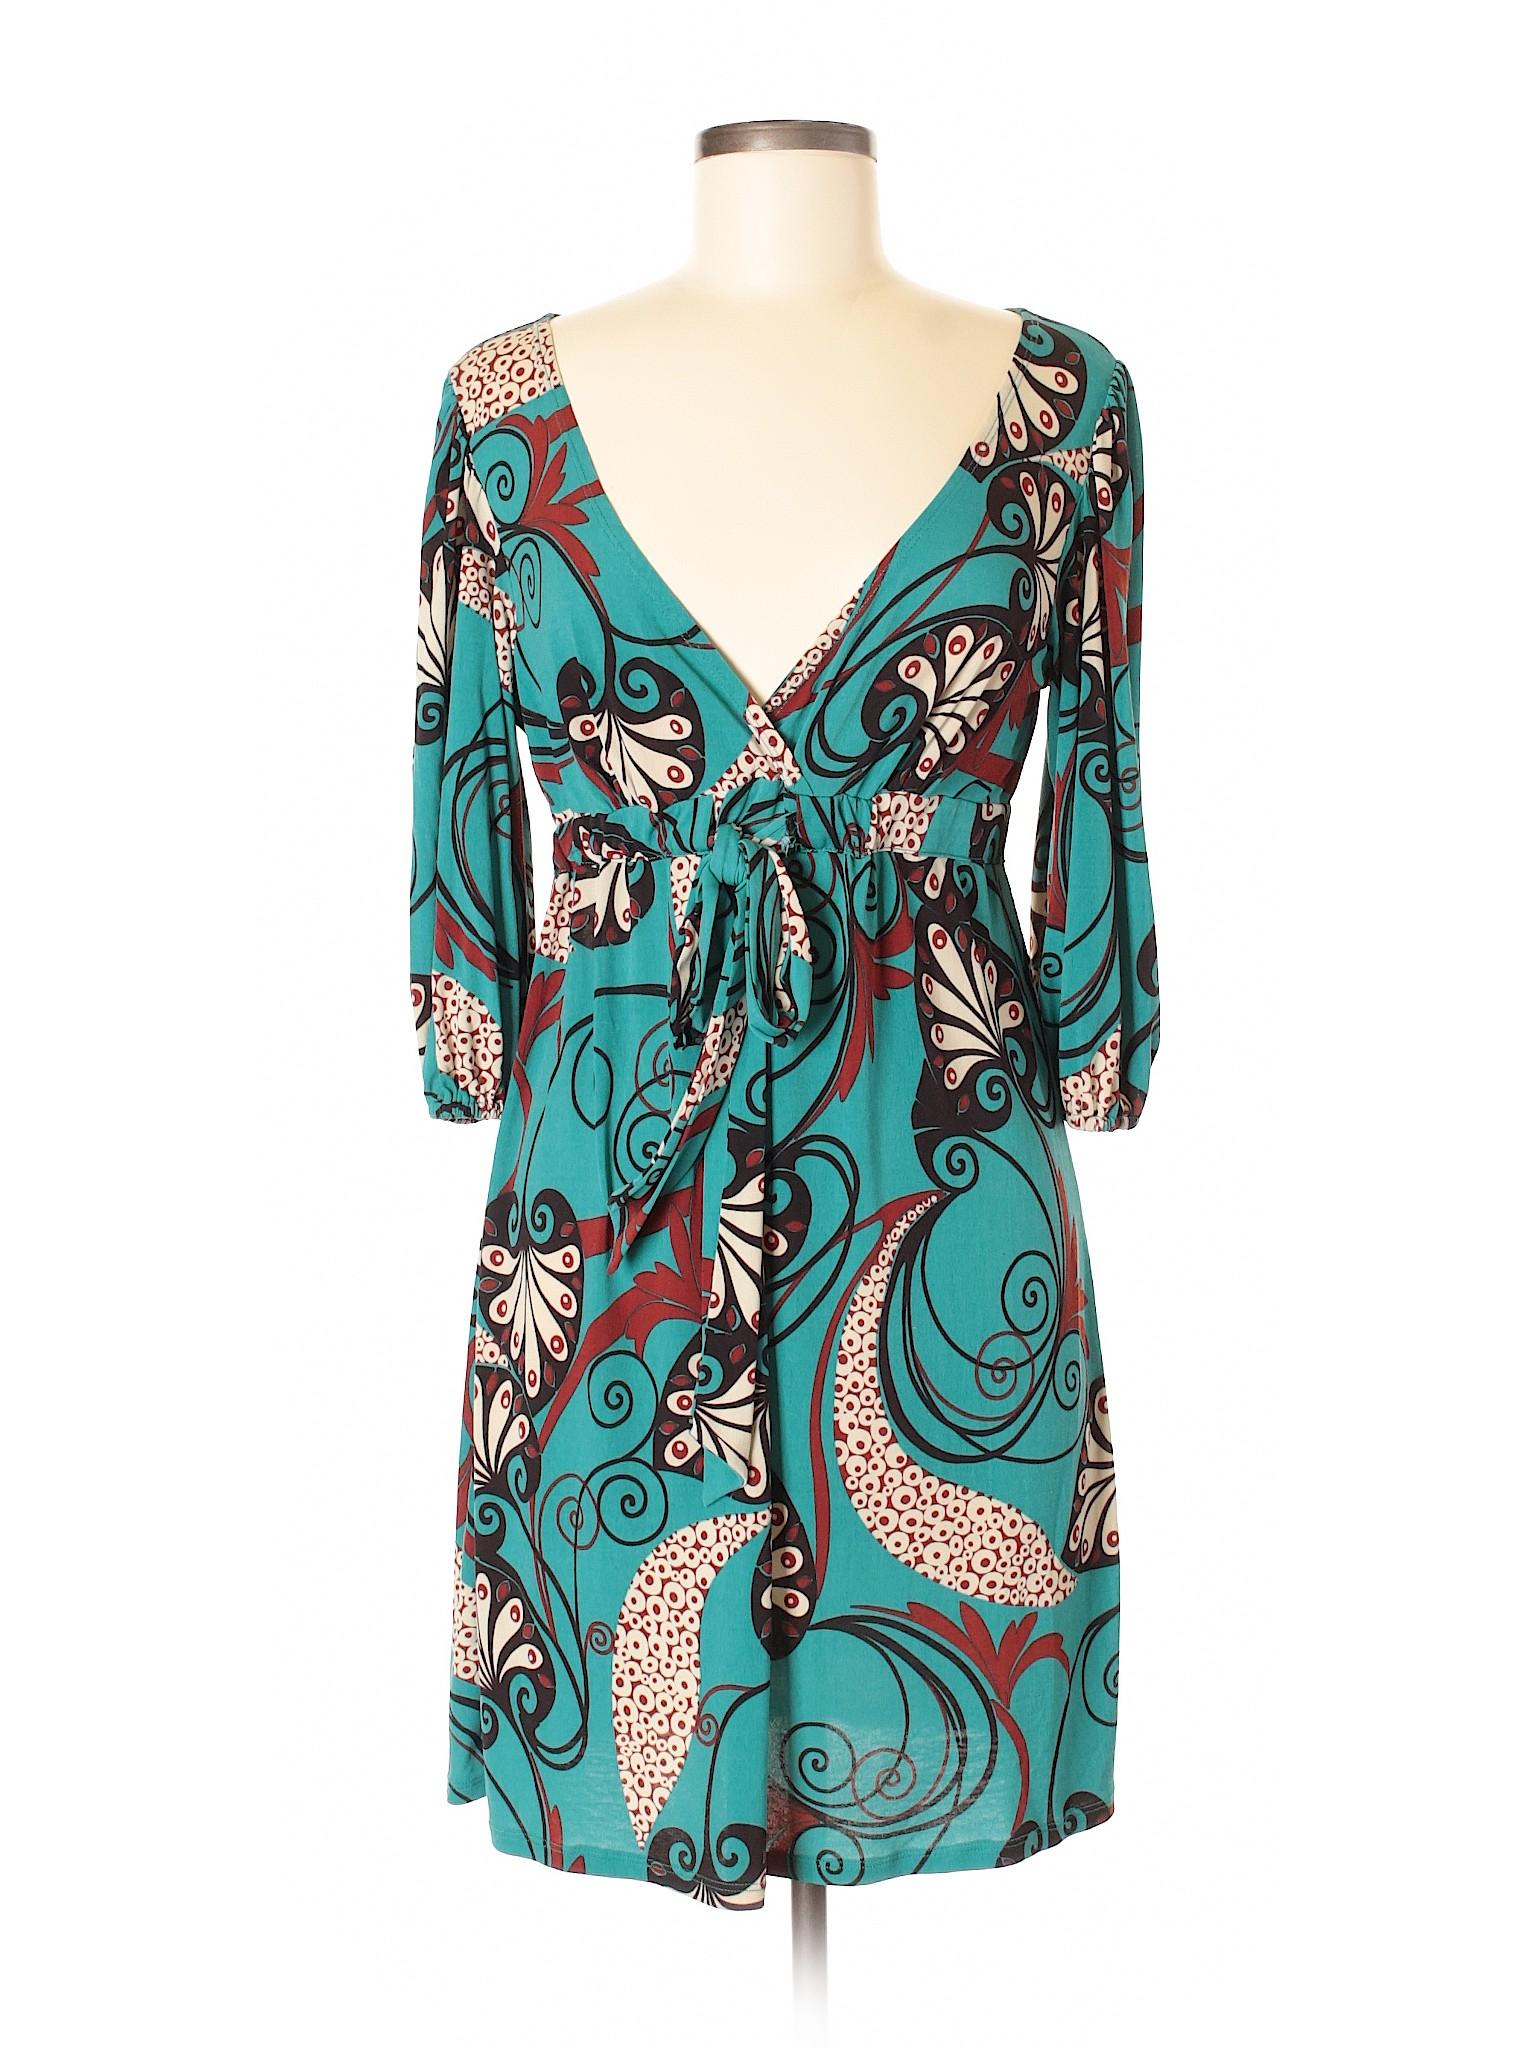 winter Bisou Dress Casual Boutique Bisou pgWZpT